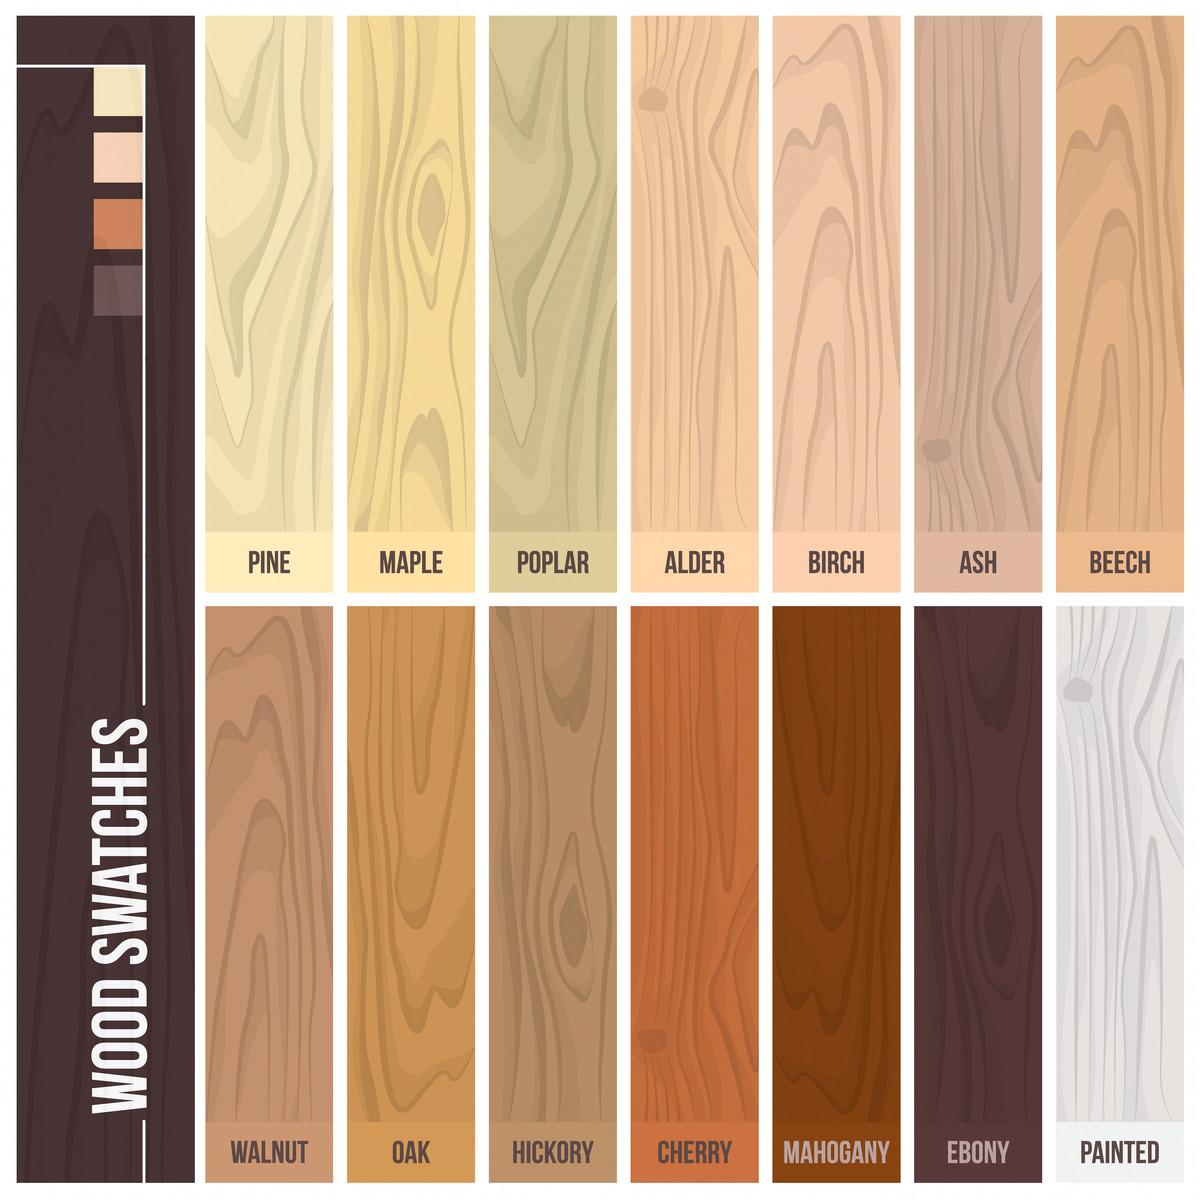 hardwood floor installation glue of 12 types of hardwood flooring species styles edging dimensions within types of hardwood flooring illustrated guide